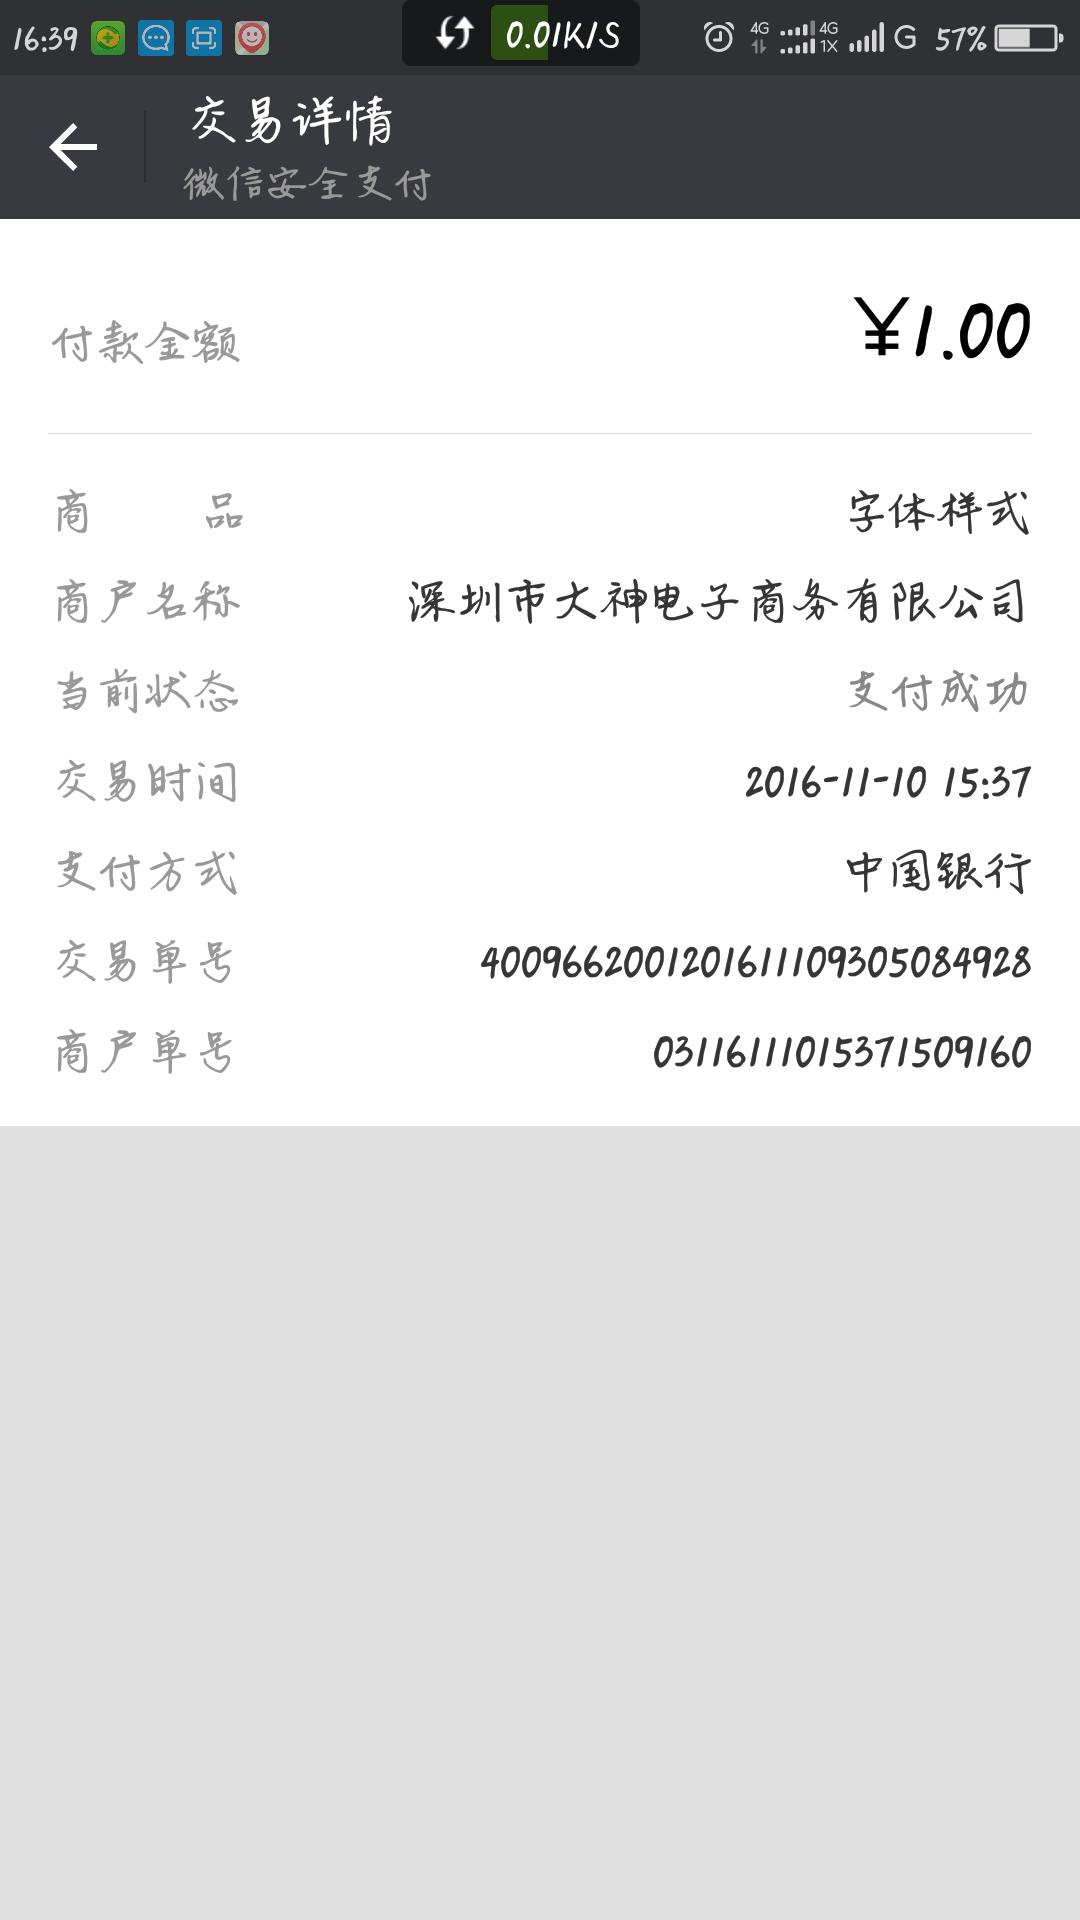 Screenshot_2016-11-10-16-39-29.png